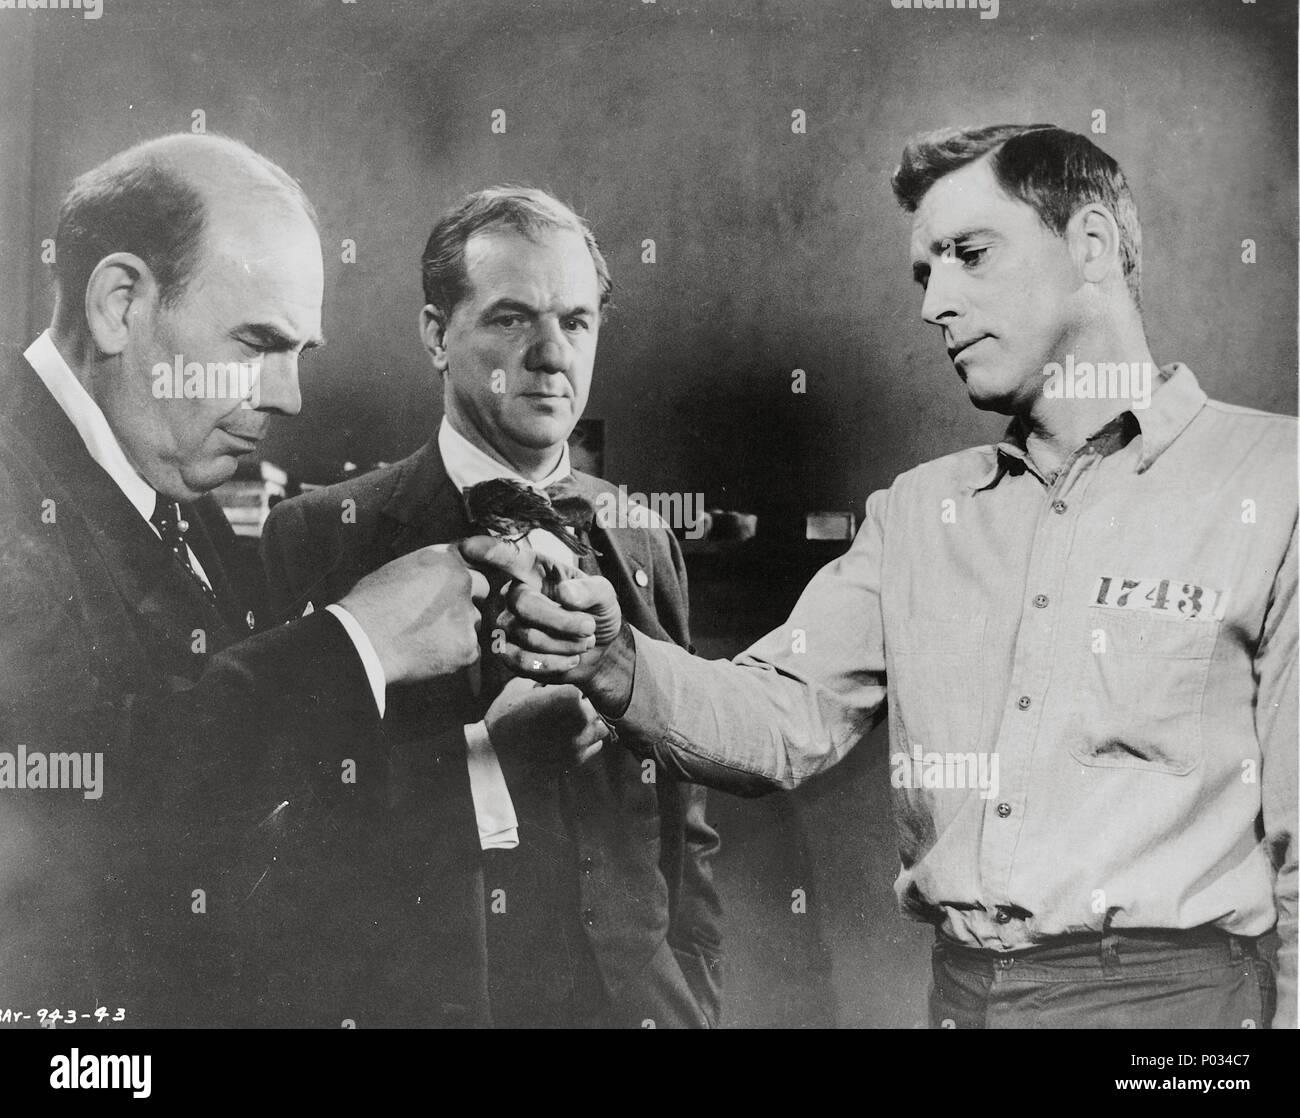 Original Film Title: BIRDMAN OF ALCATRAZ.  English Title: BIRDMAN OF ALCATRAZ.  Film Director: JOHN FRANKENHEIMER.  Year: 1962.  Stars: KARL MALDEN; BURT LANCASTER. Credit: UNITED ARTISTS / Album Stock Photo